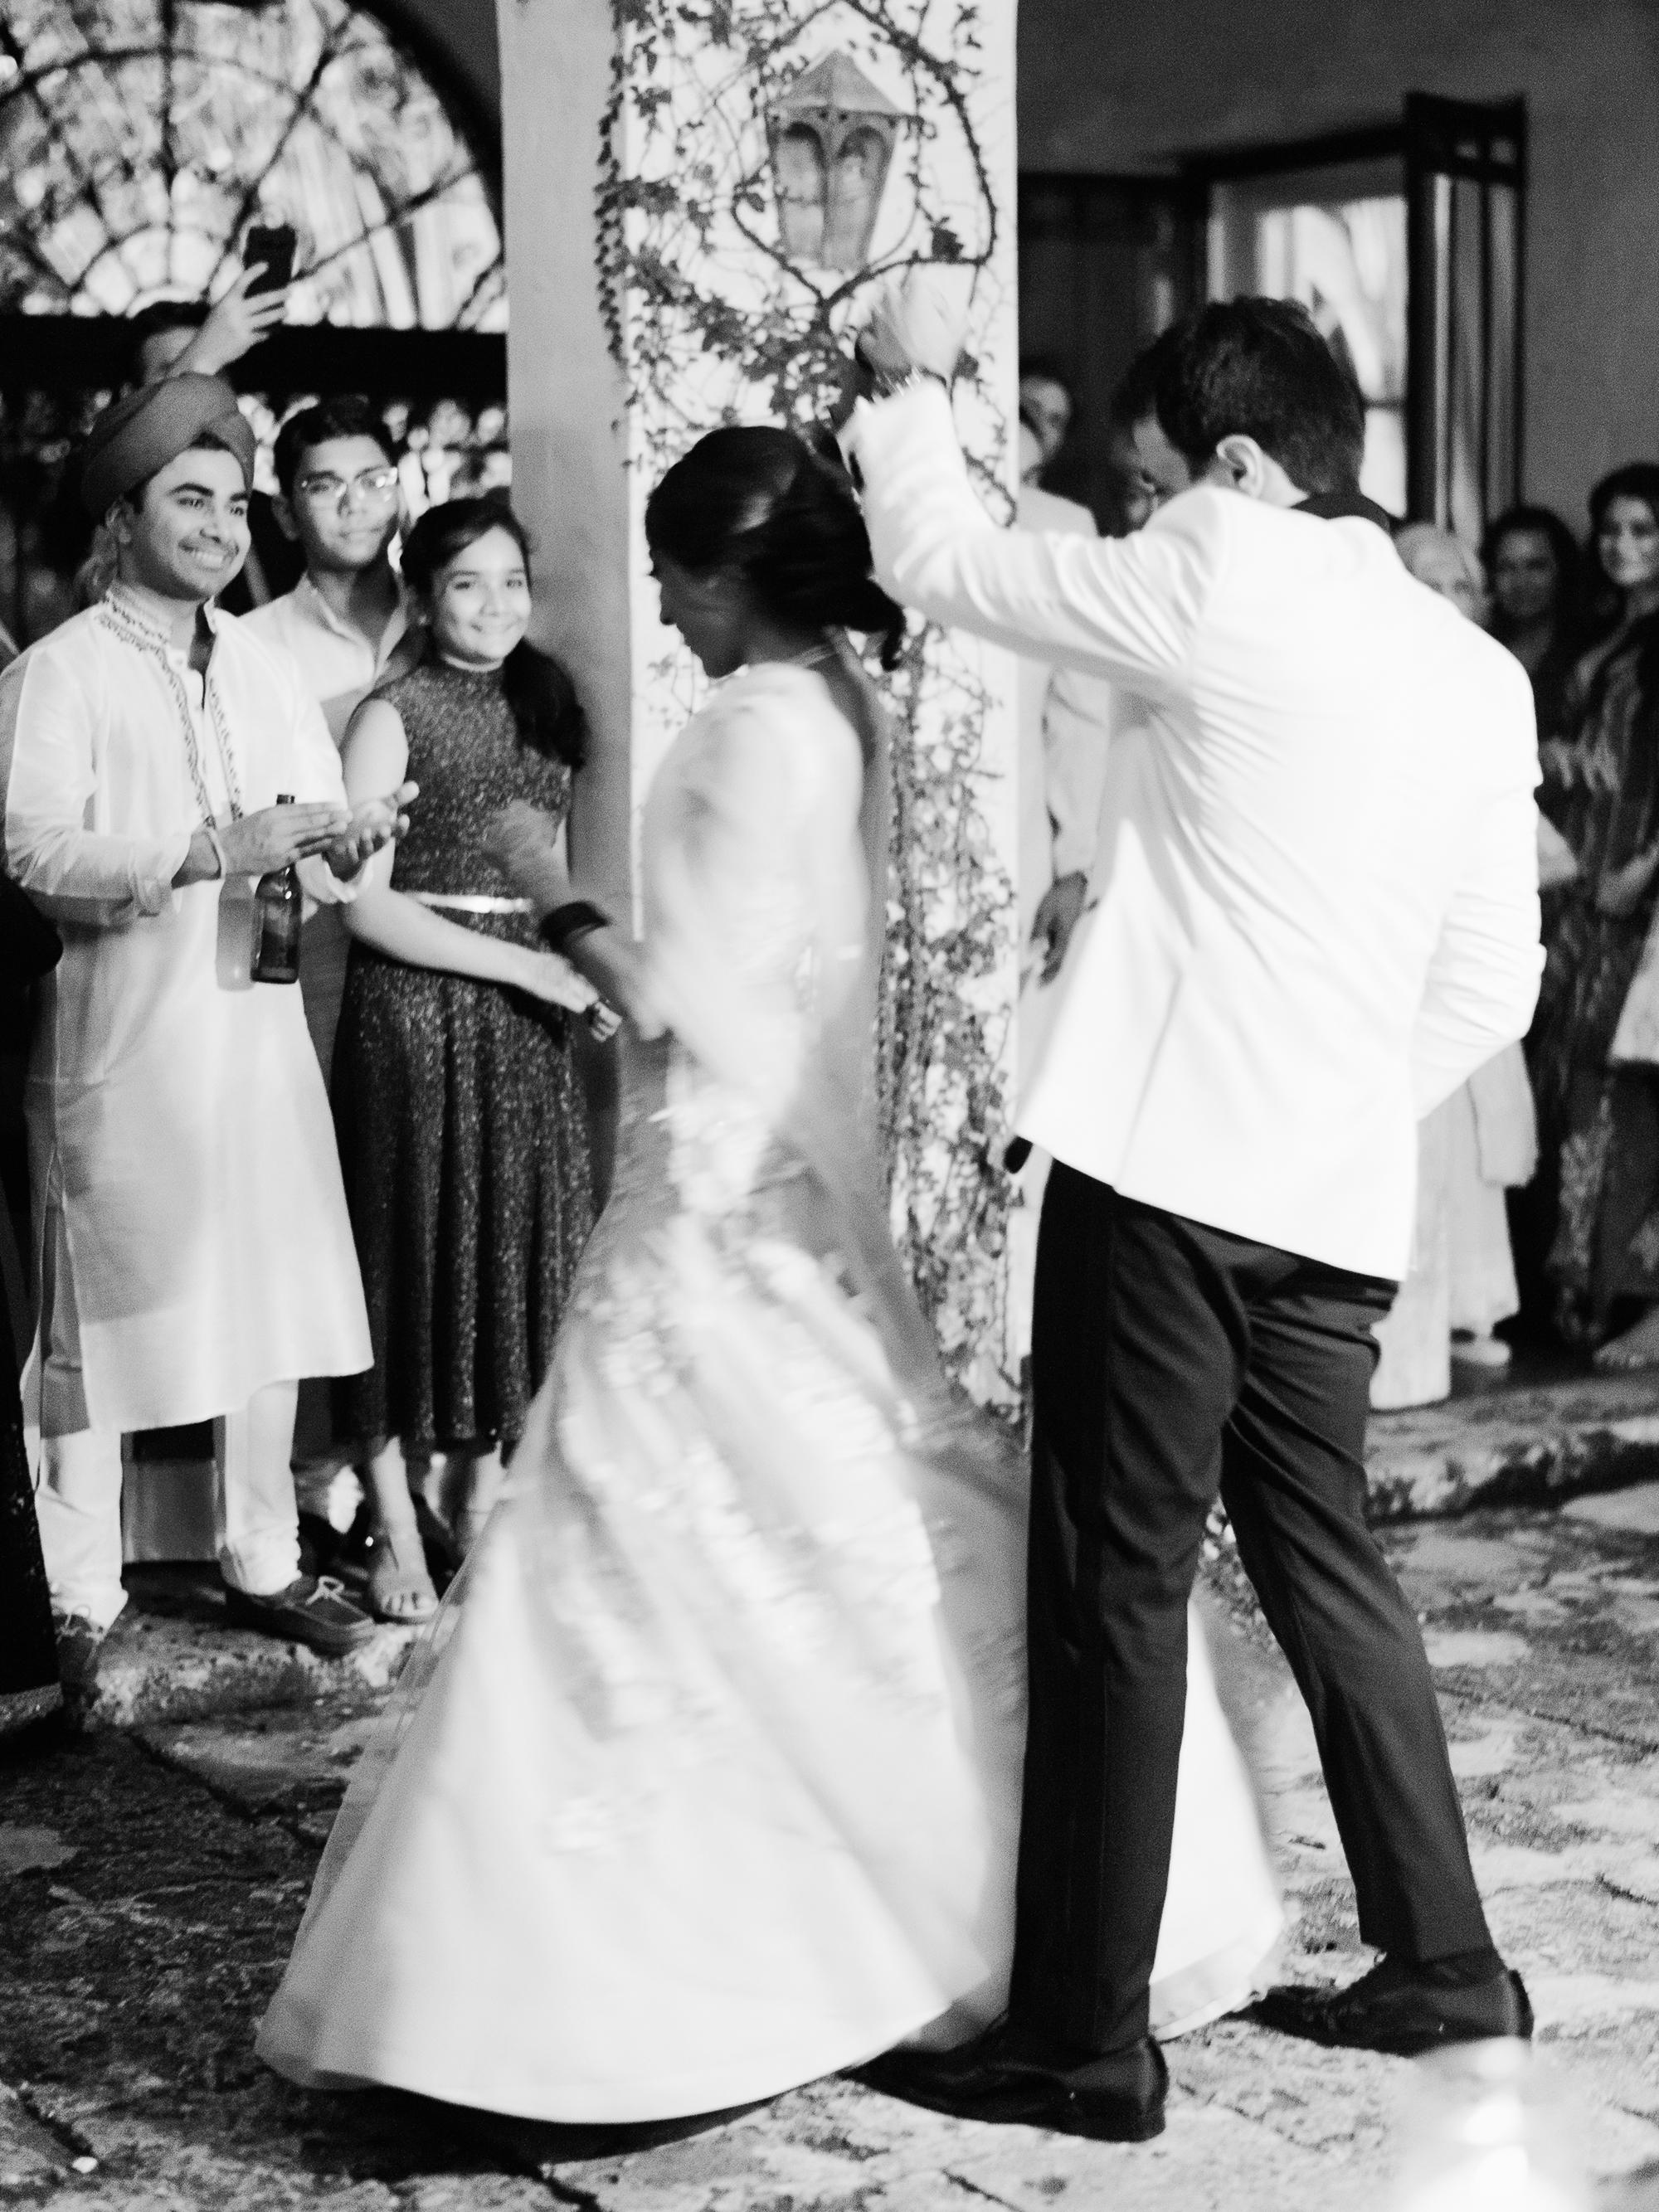 anuja nikhil wedding first dance